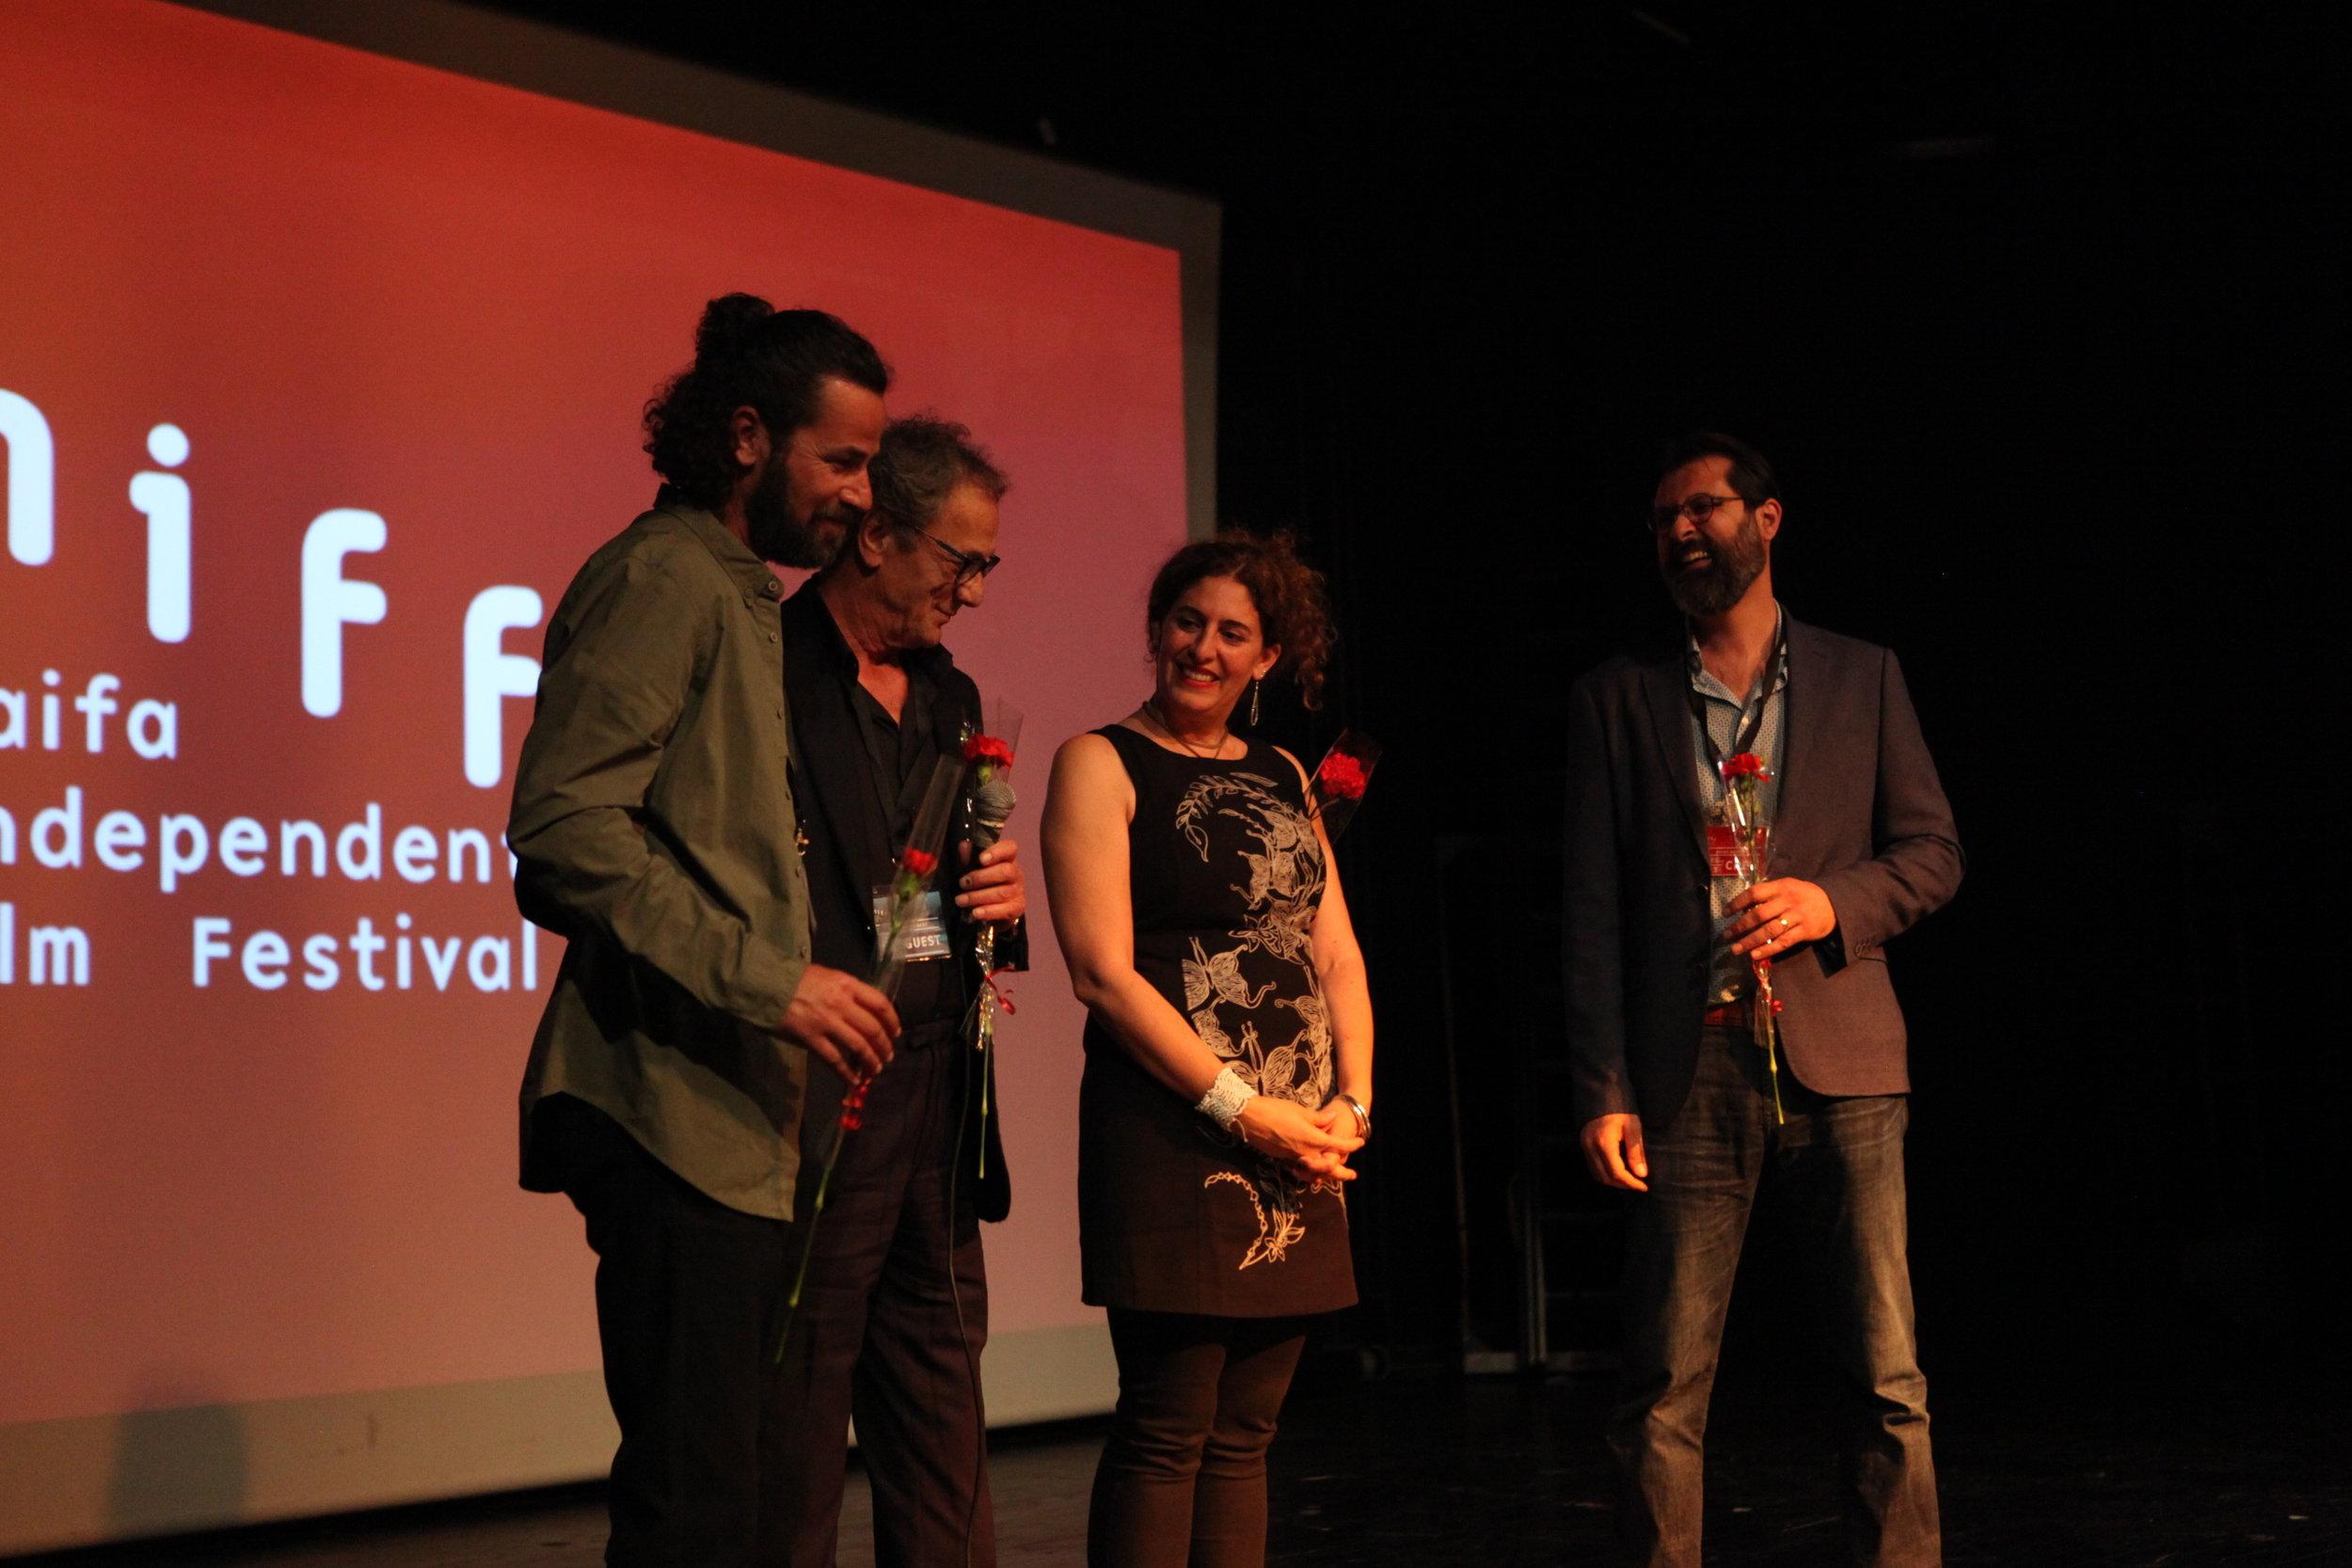 Haifa Independent Film Festival HIFF 2018_8610.JPG